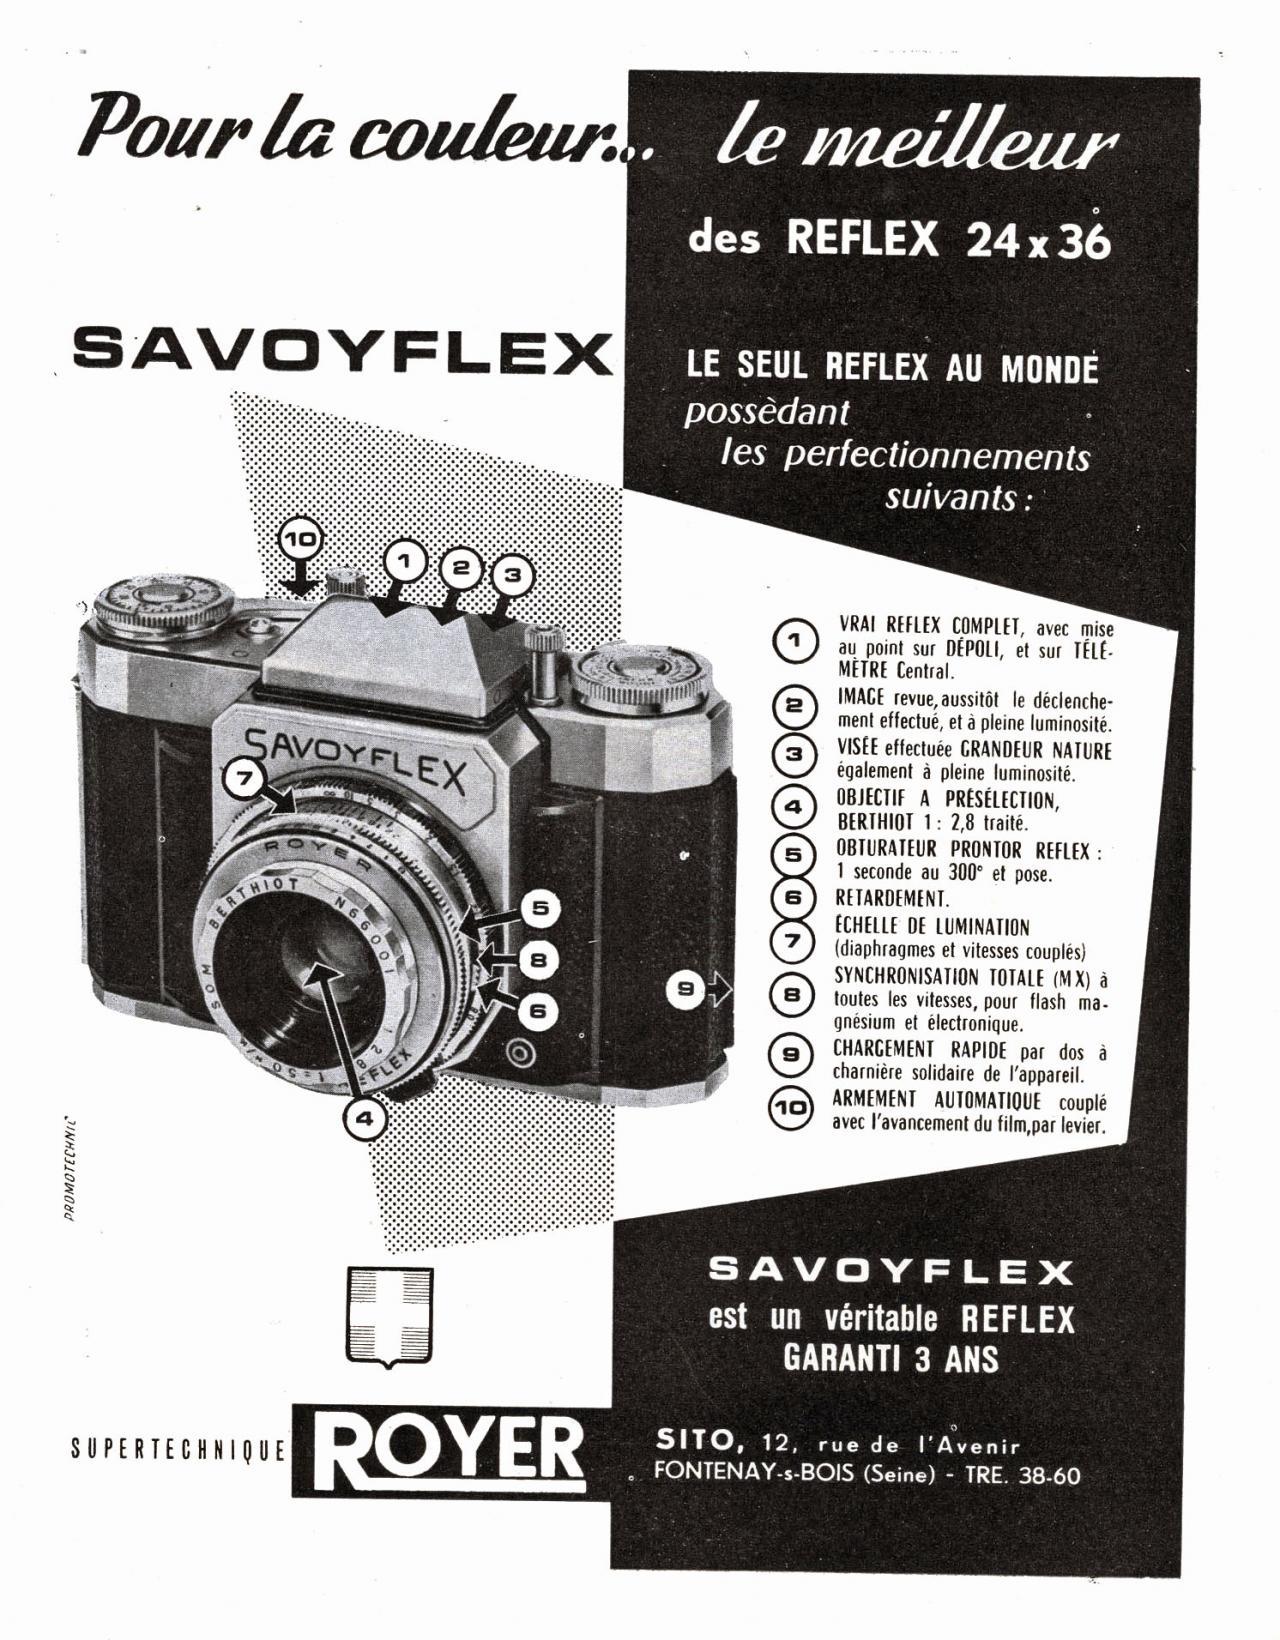 Wallpaper 1449-5  SITO de ROYER  Savoyflex type II, collection AMI Appareils photos